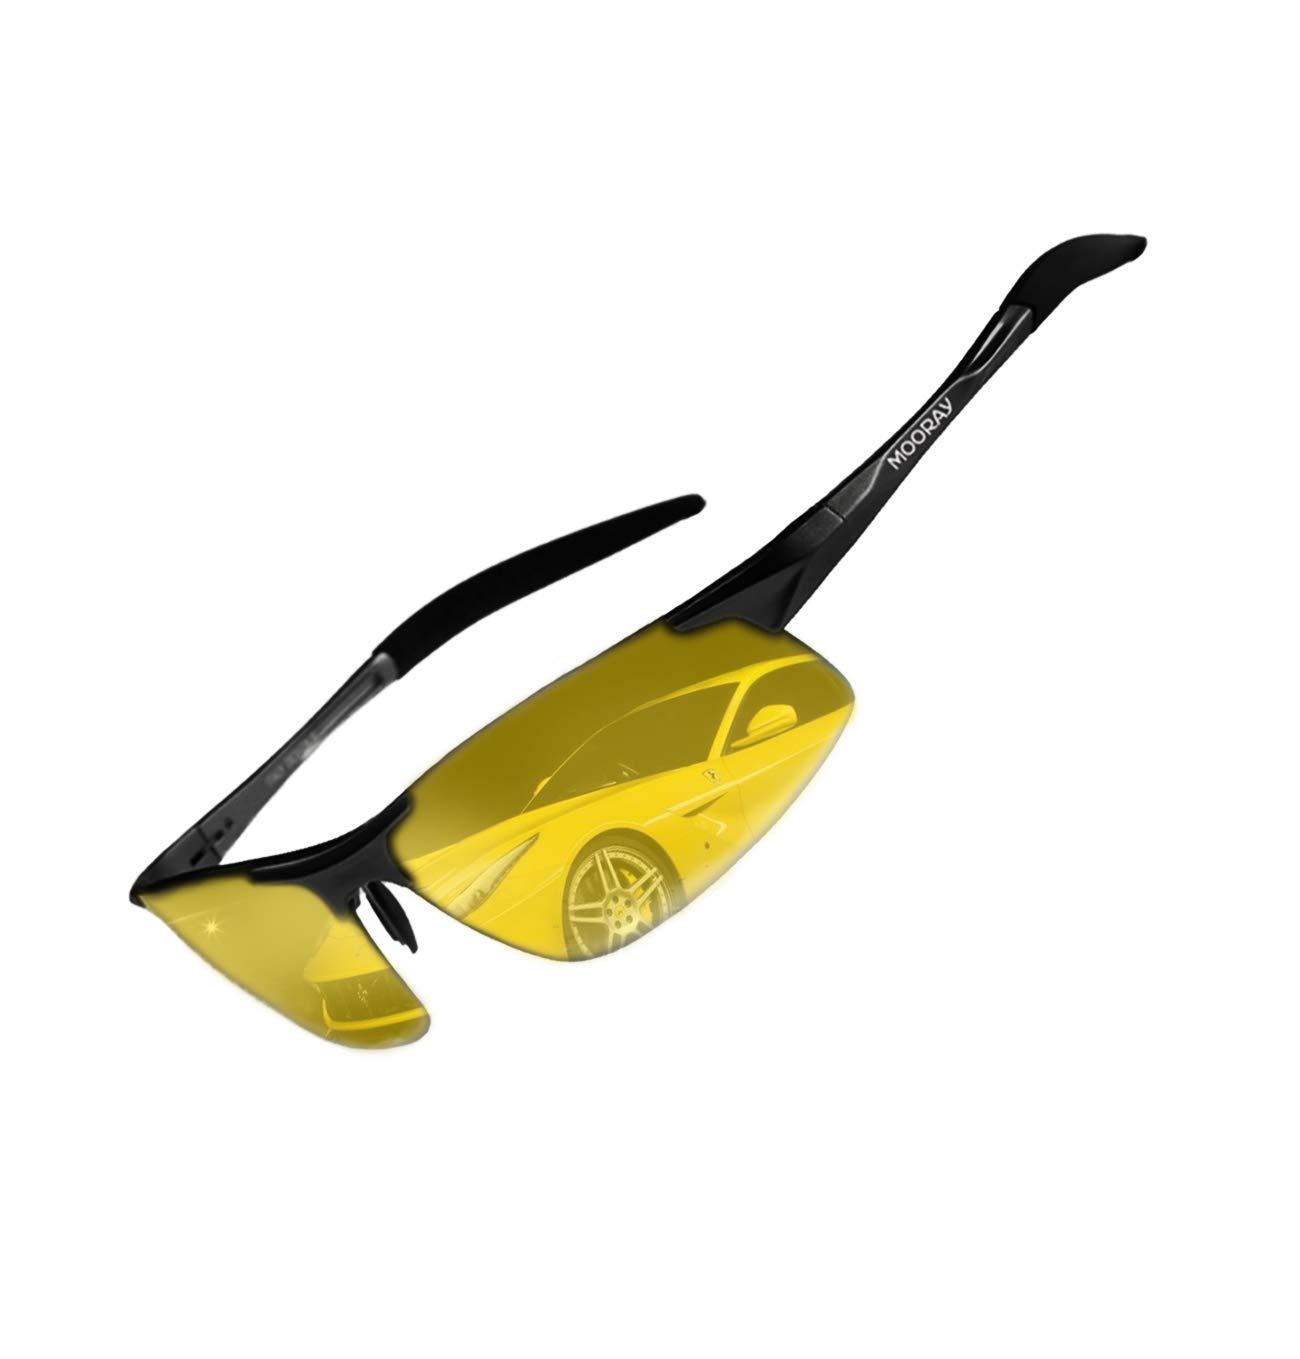 MOORAY Mens Night Driving Night Vision Glasses Fashion Sunglasses for Fishing Cycling (Hd Night Vision) by MOORAY